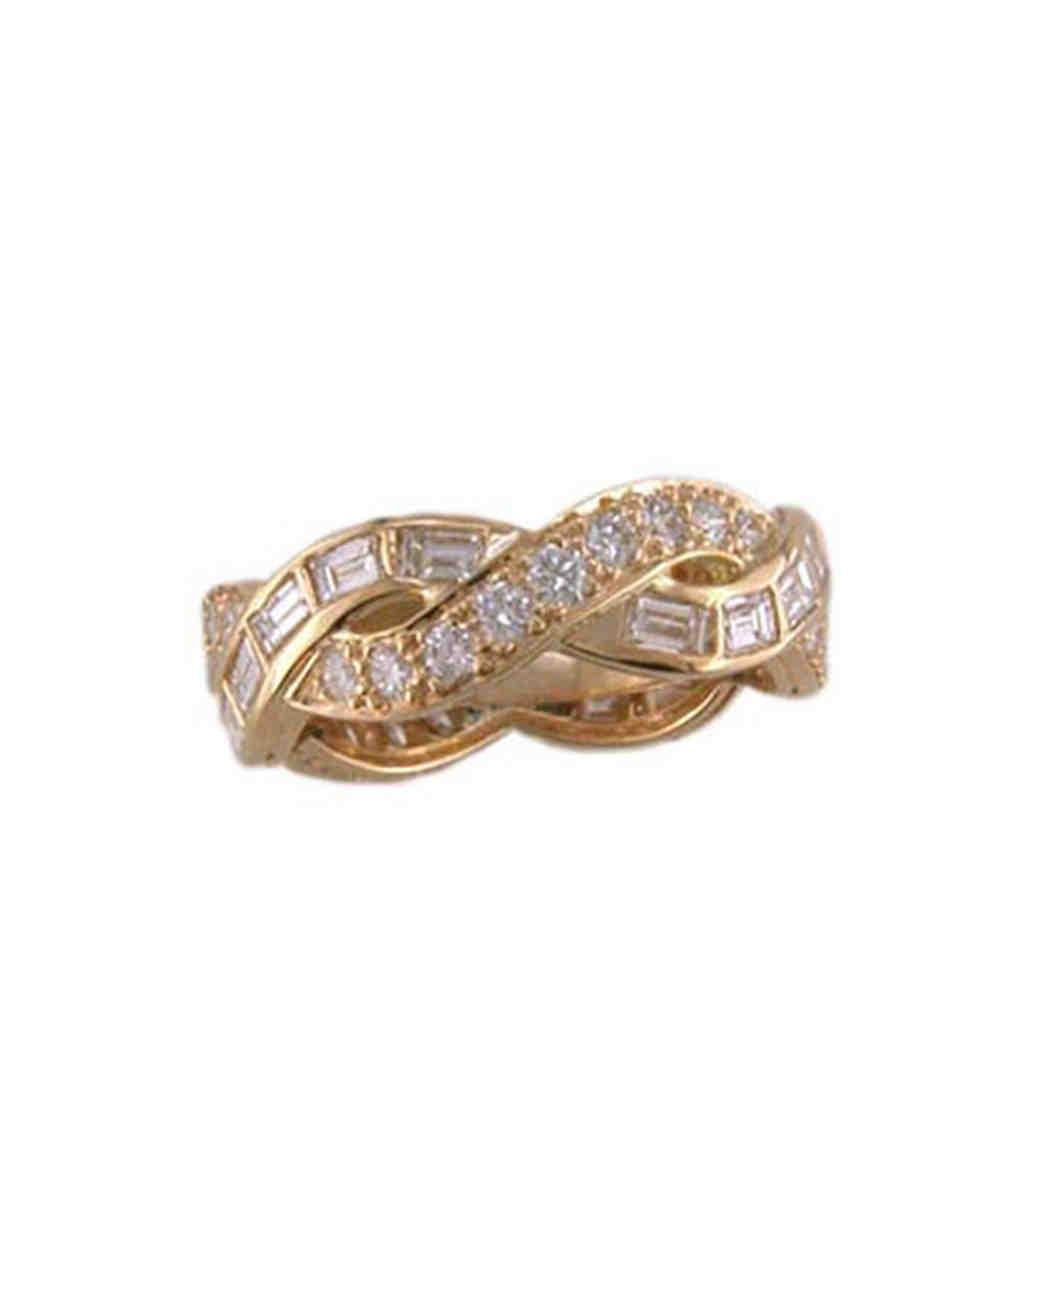 heyman_ohb_w3769_xx1462c_gold_dia_ring.jpg